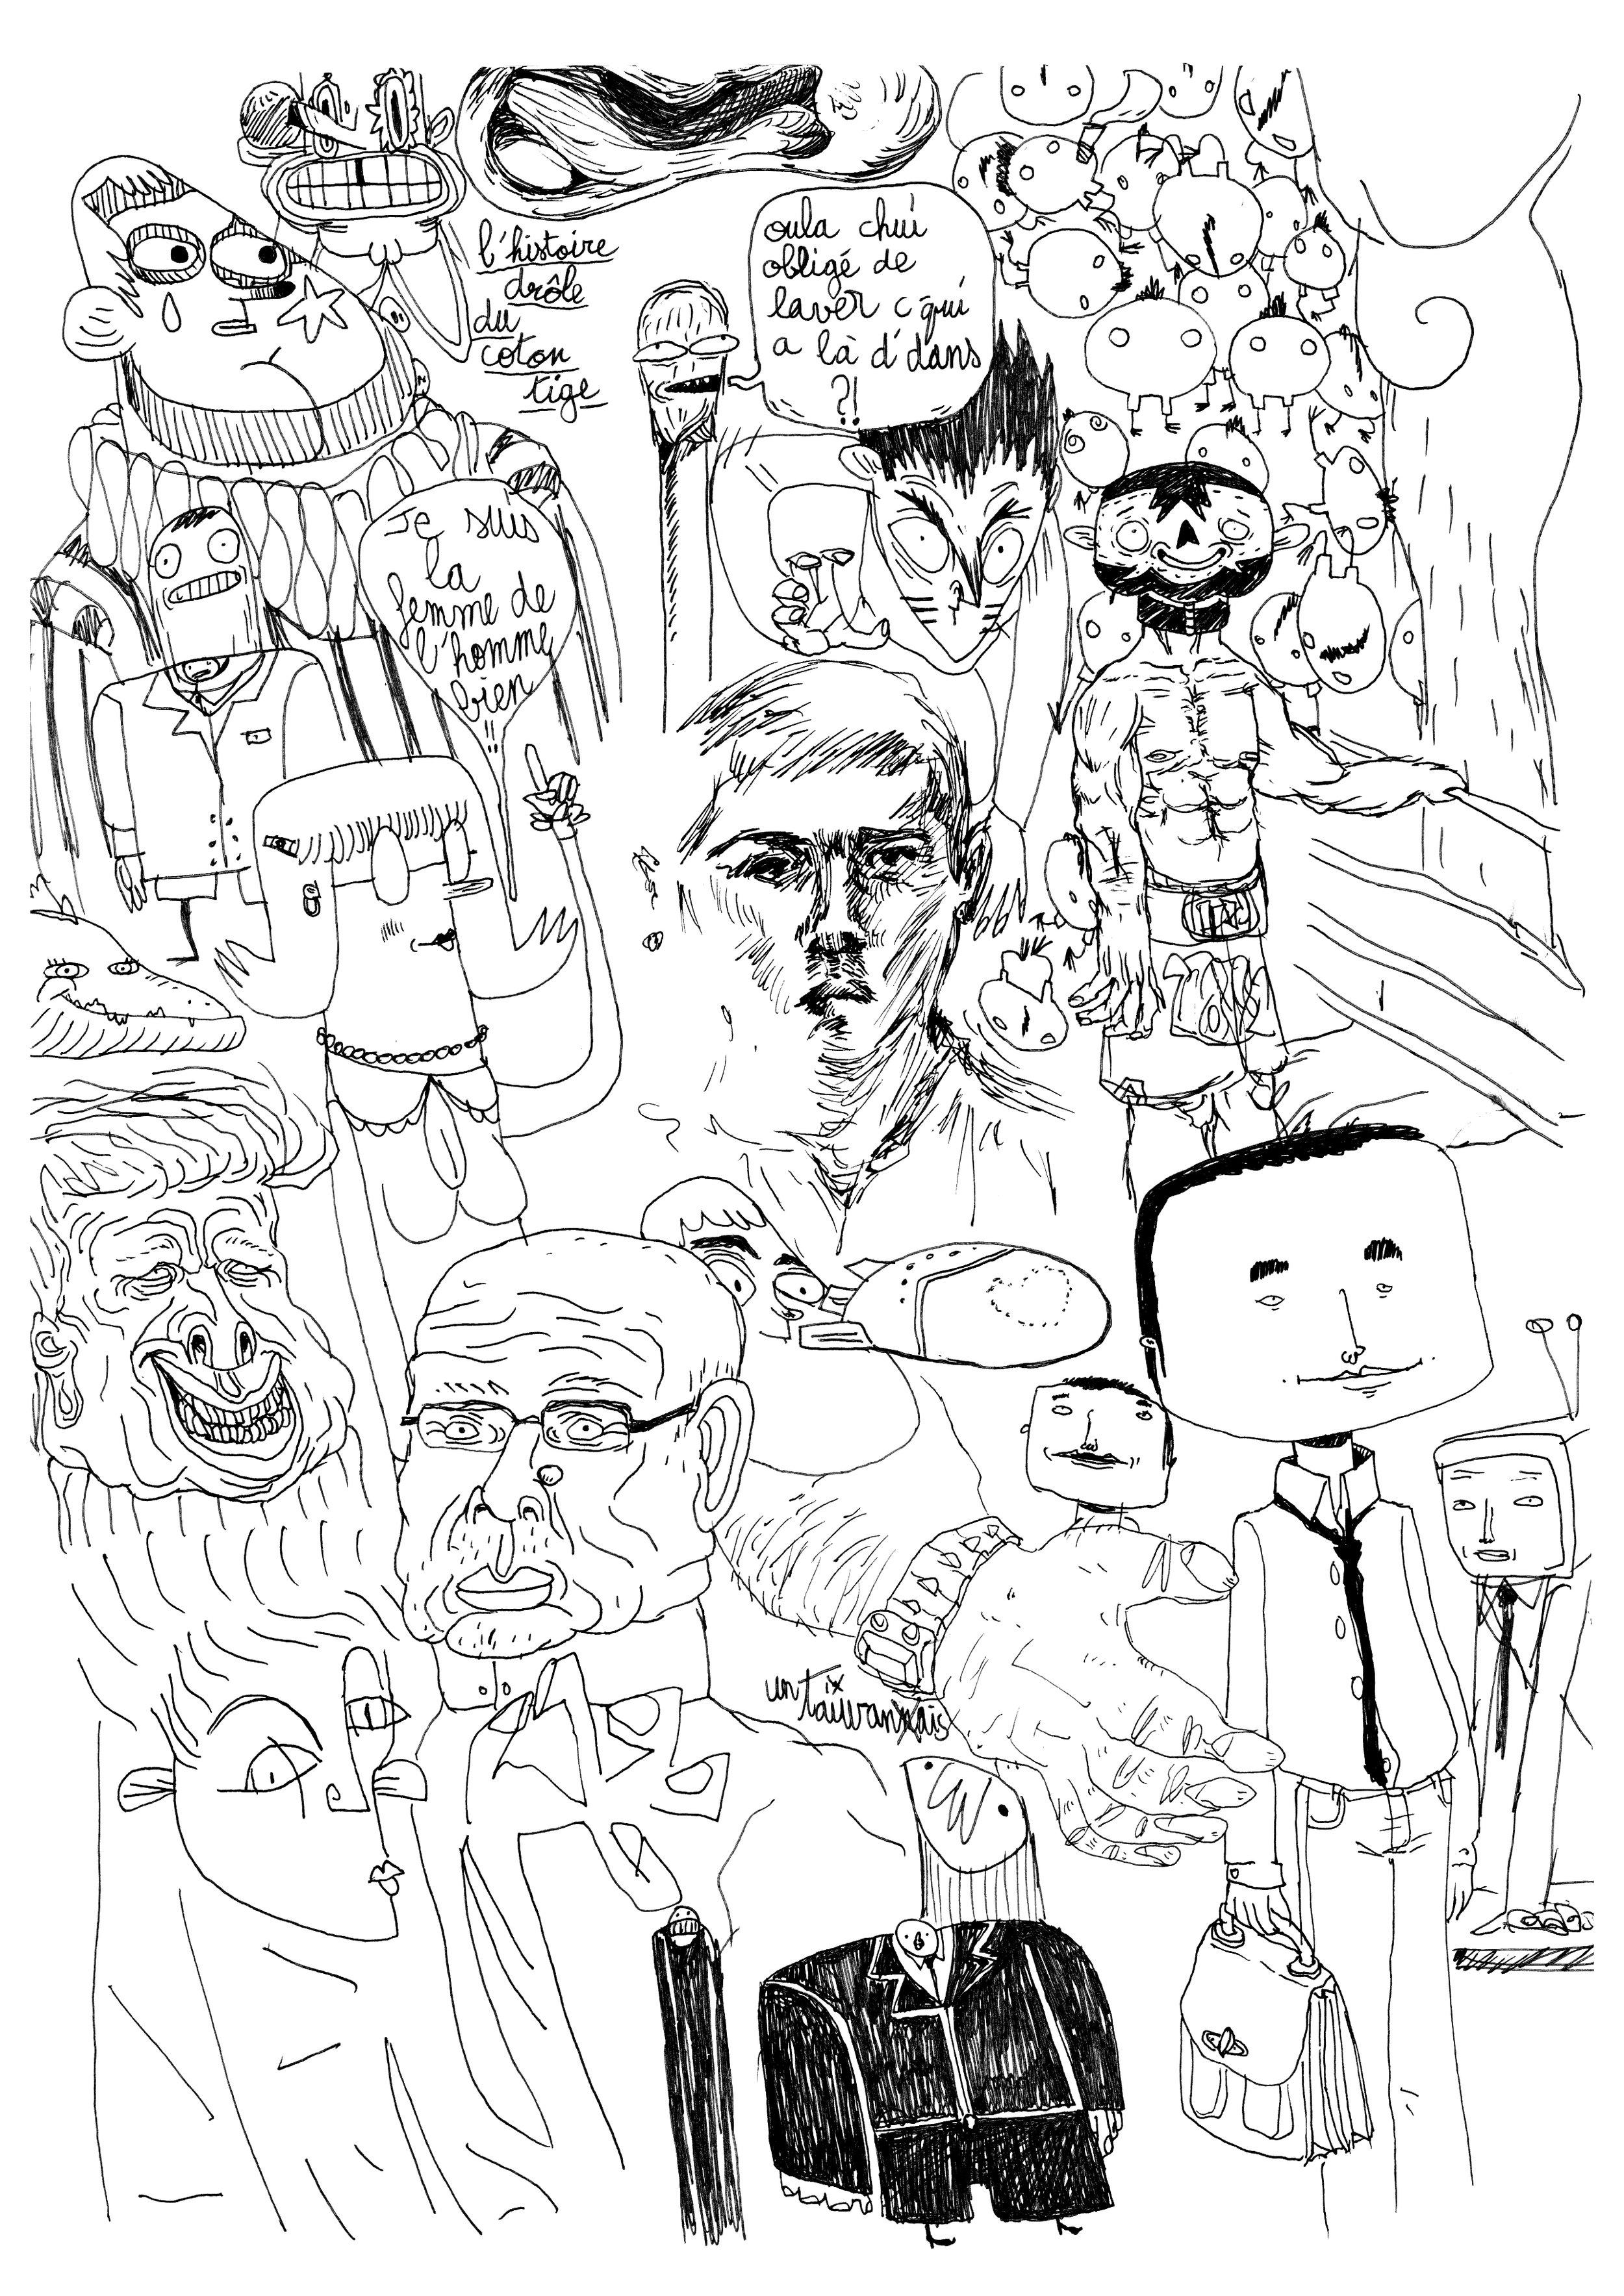 Pascal_Zaffiro_Doodle_24.jpg